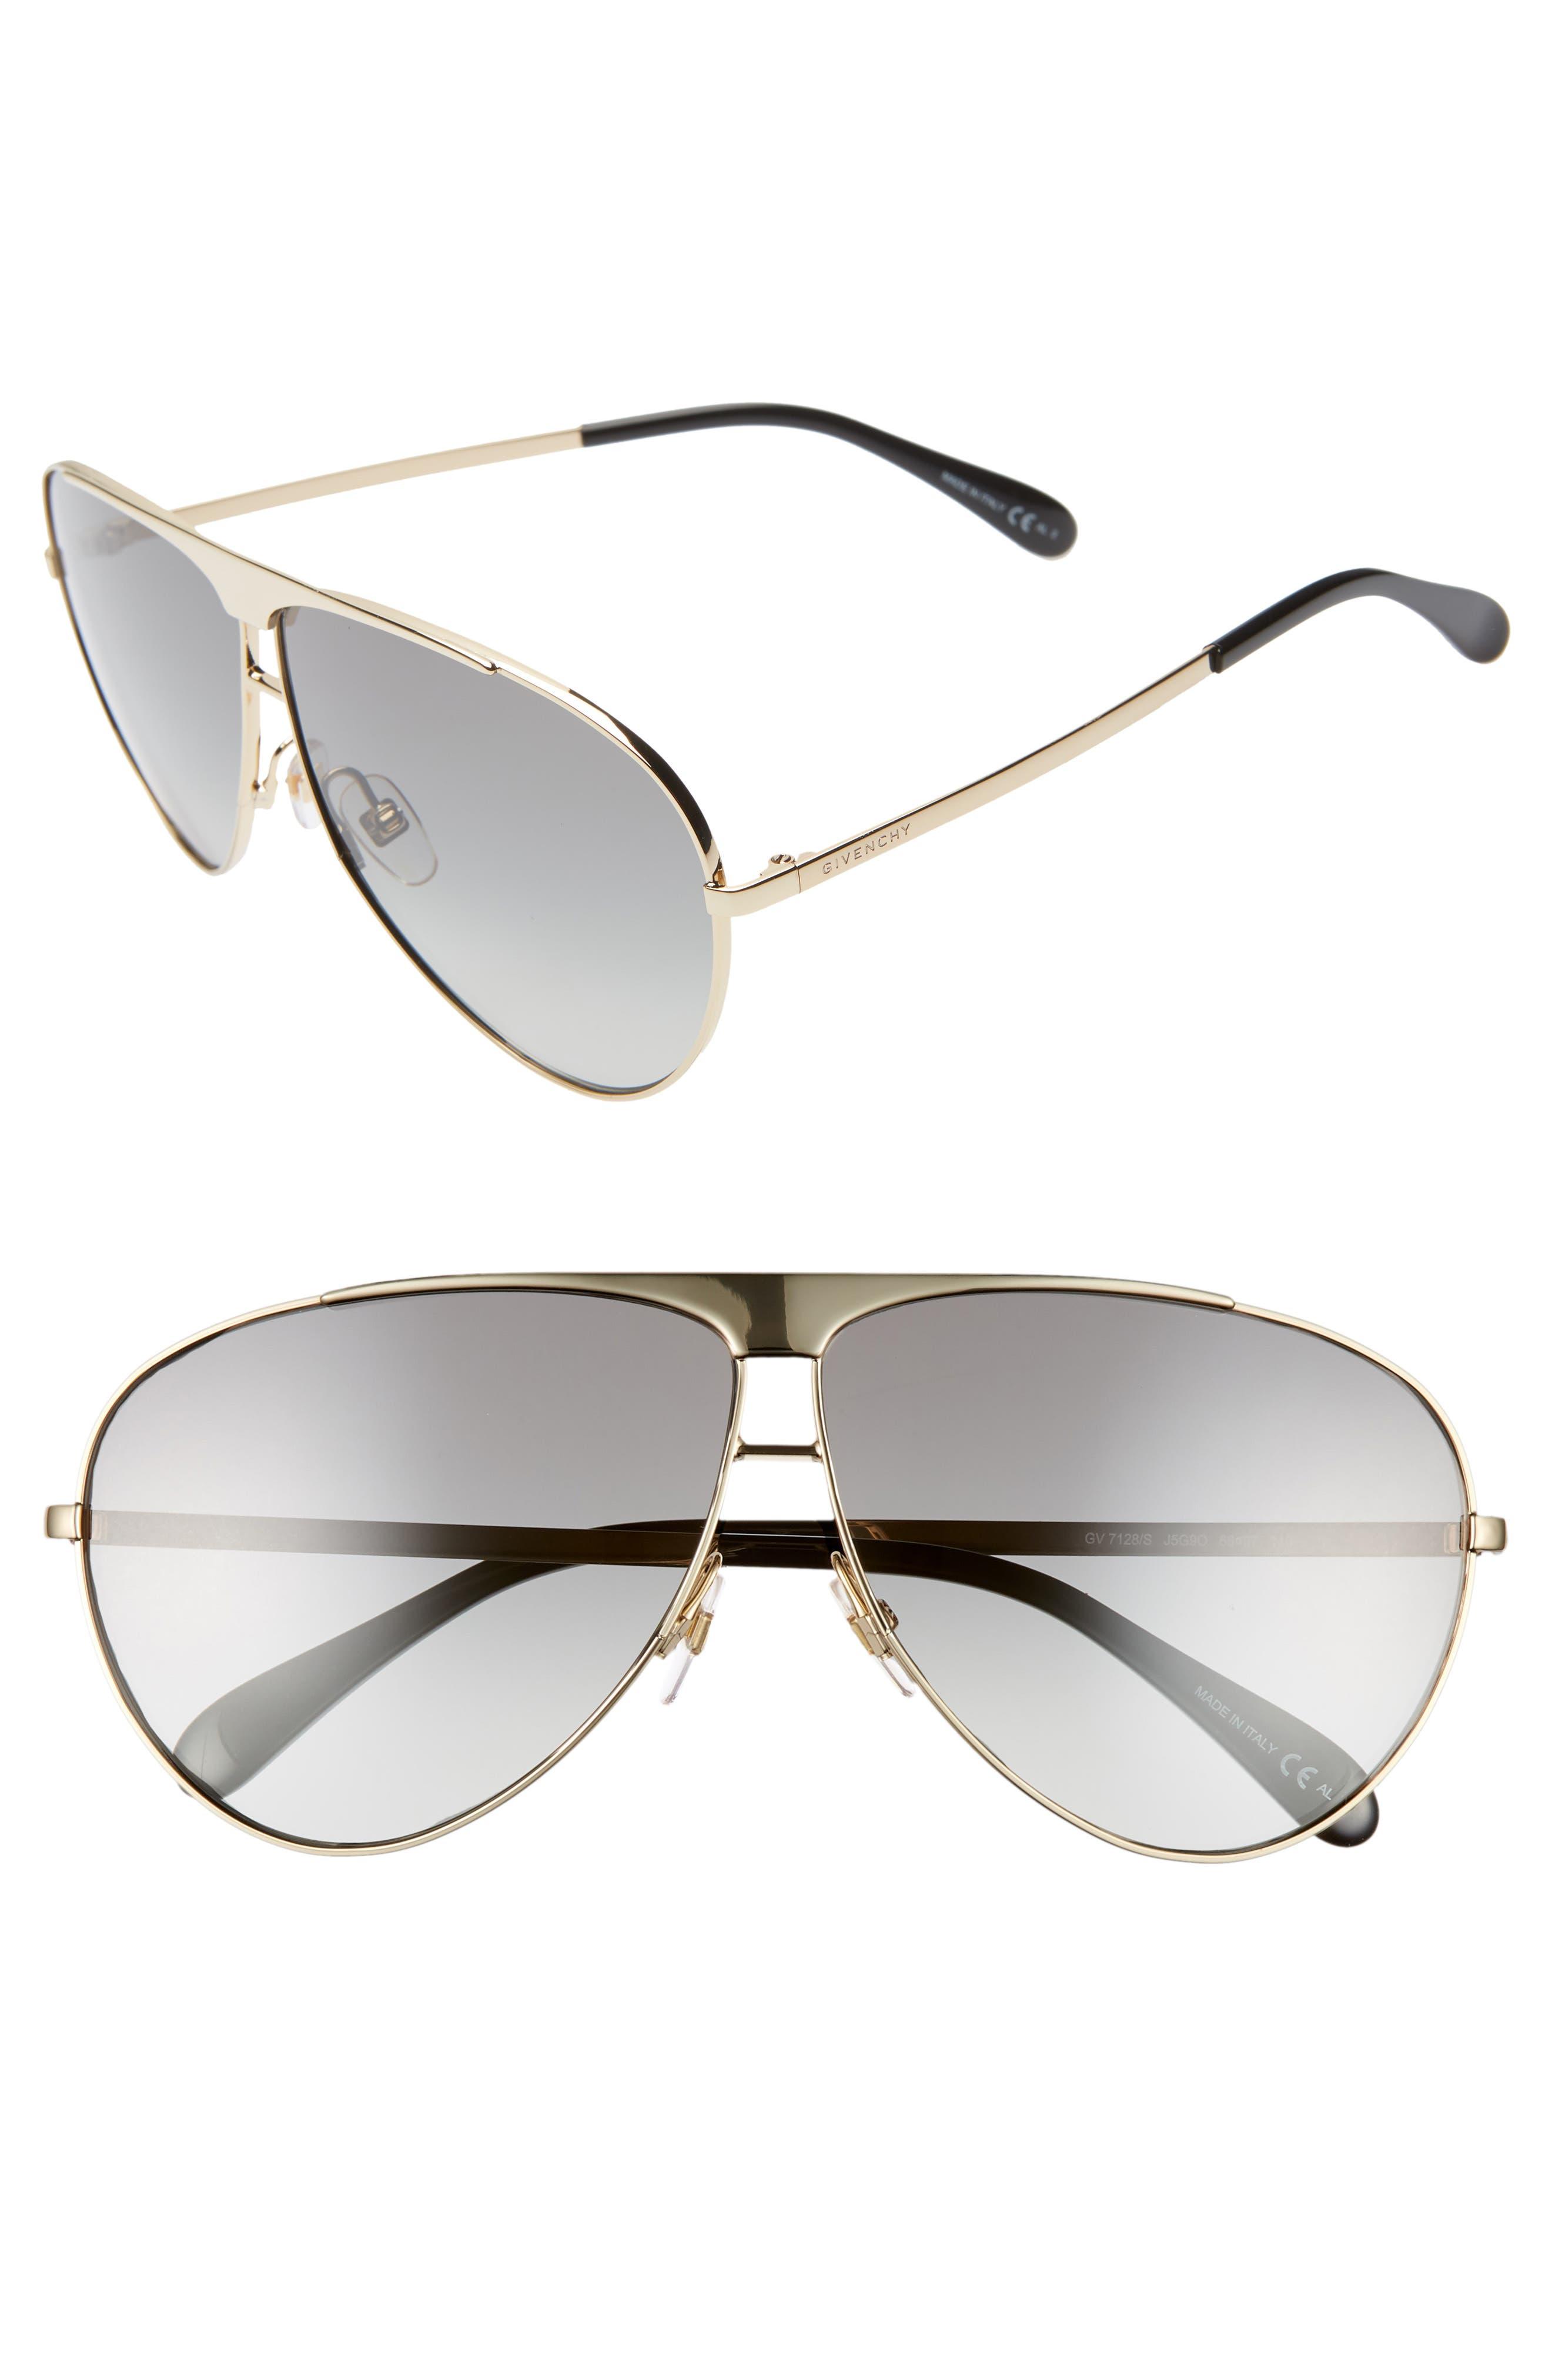 66mm Aviator Sunglasses,                             Main thumbnail 1, color,                             710